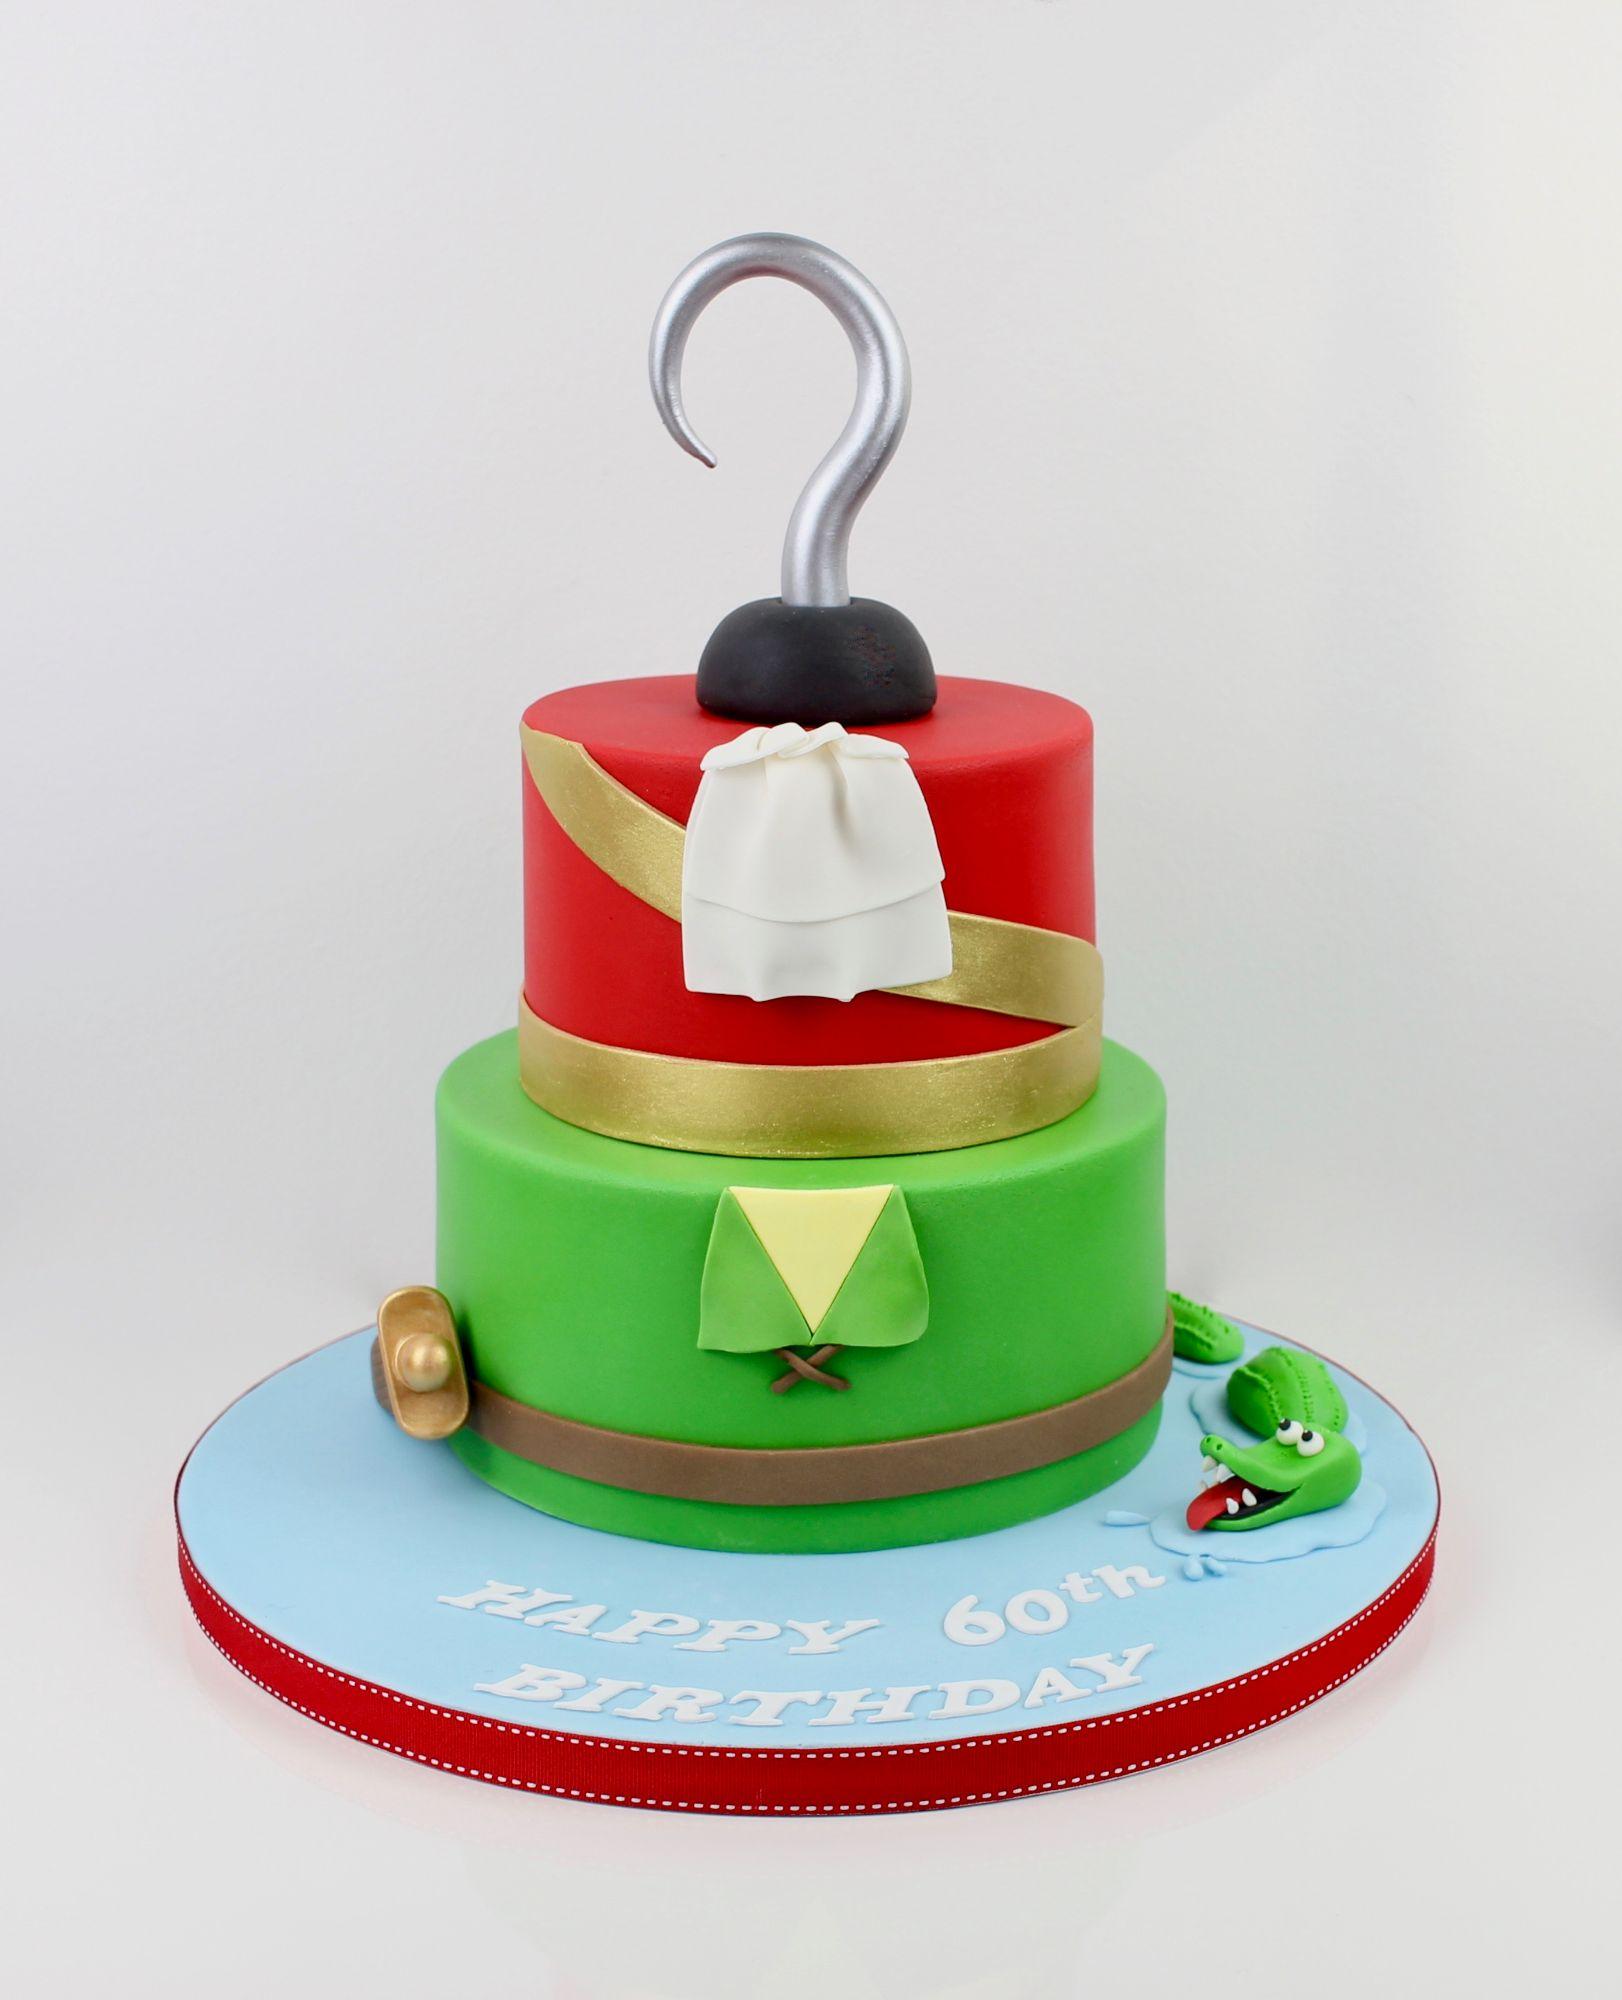 Peterpan & Captain hook cake